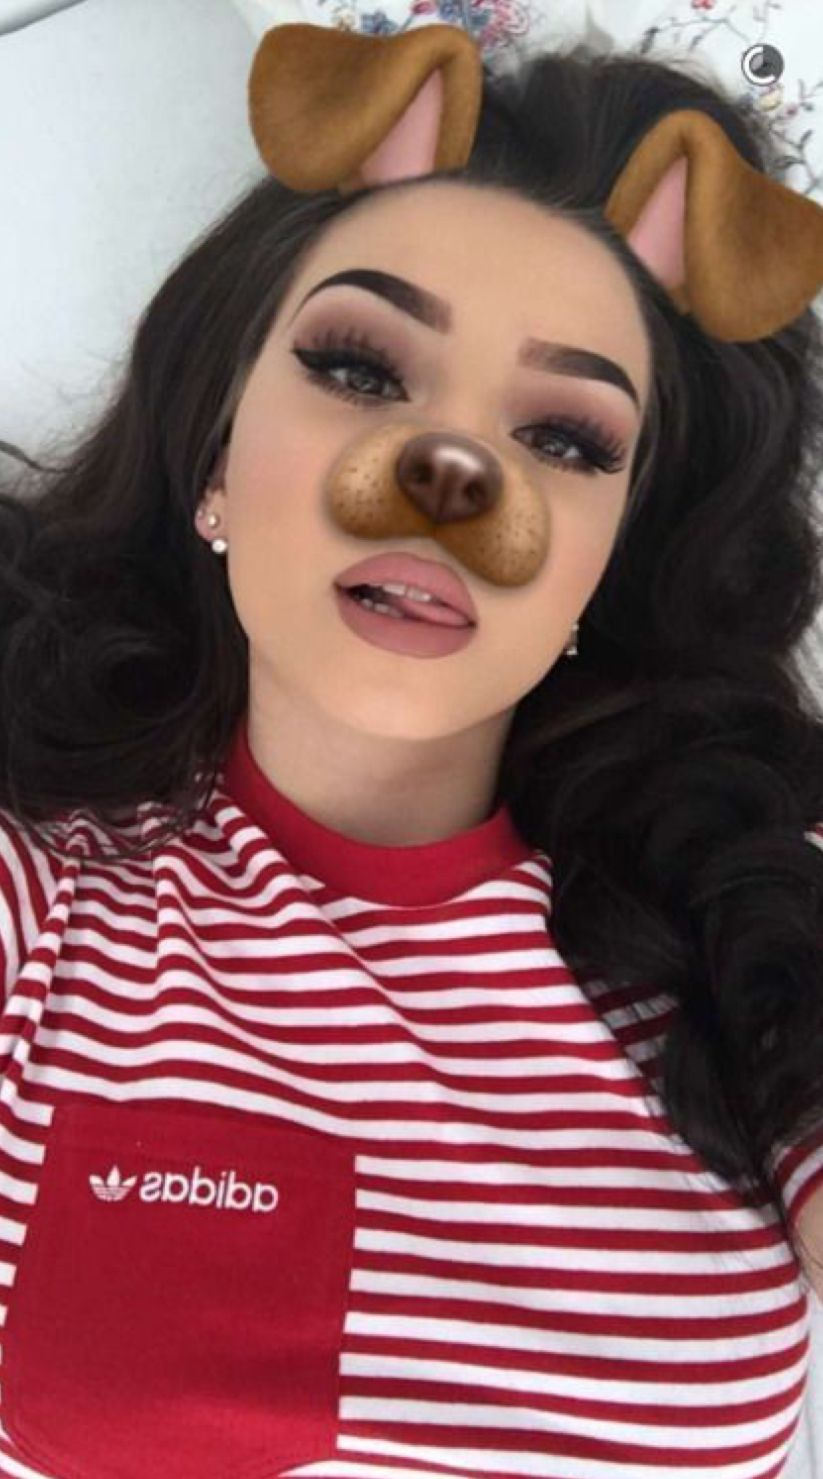 Selfie Dora Yoder nudes (83 foto and video), Tits, Paparazzi, Selfie, bra 2017